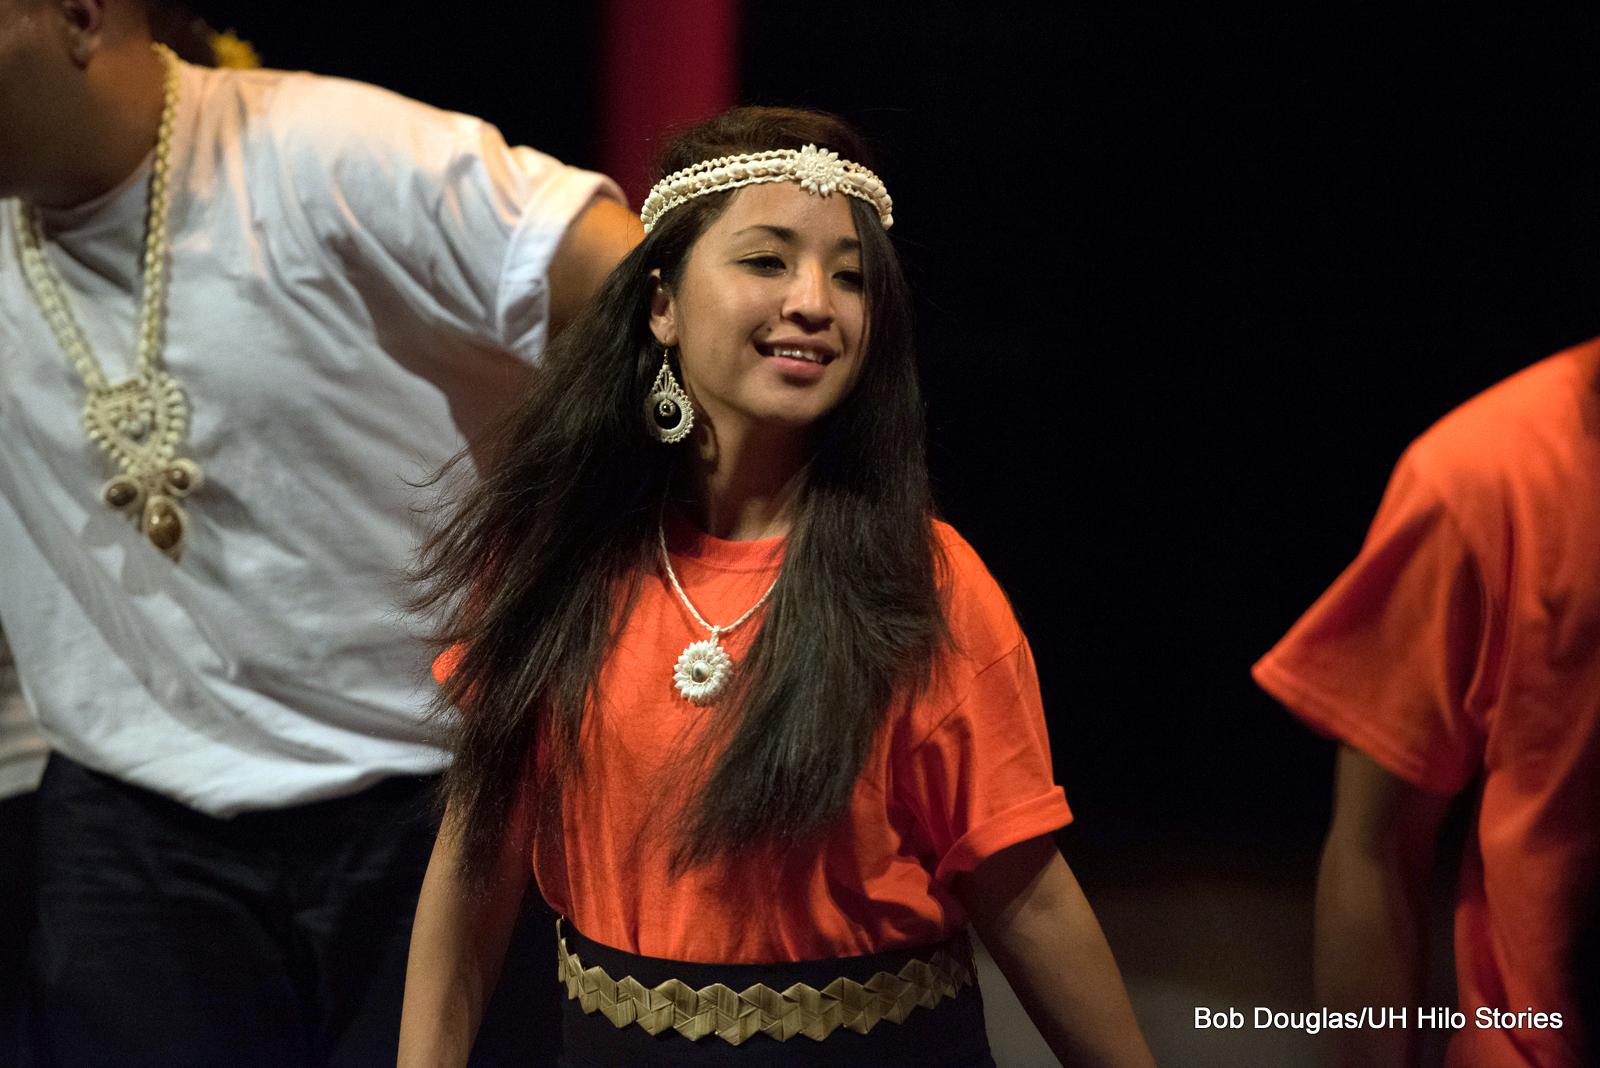 Woman in orange, dancing.